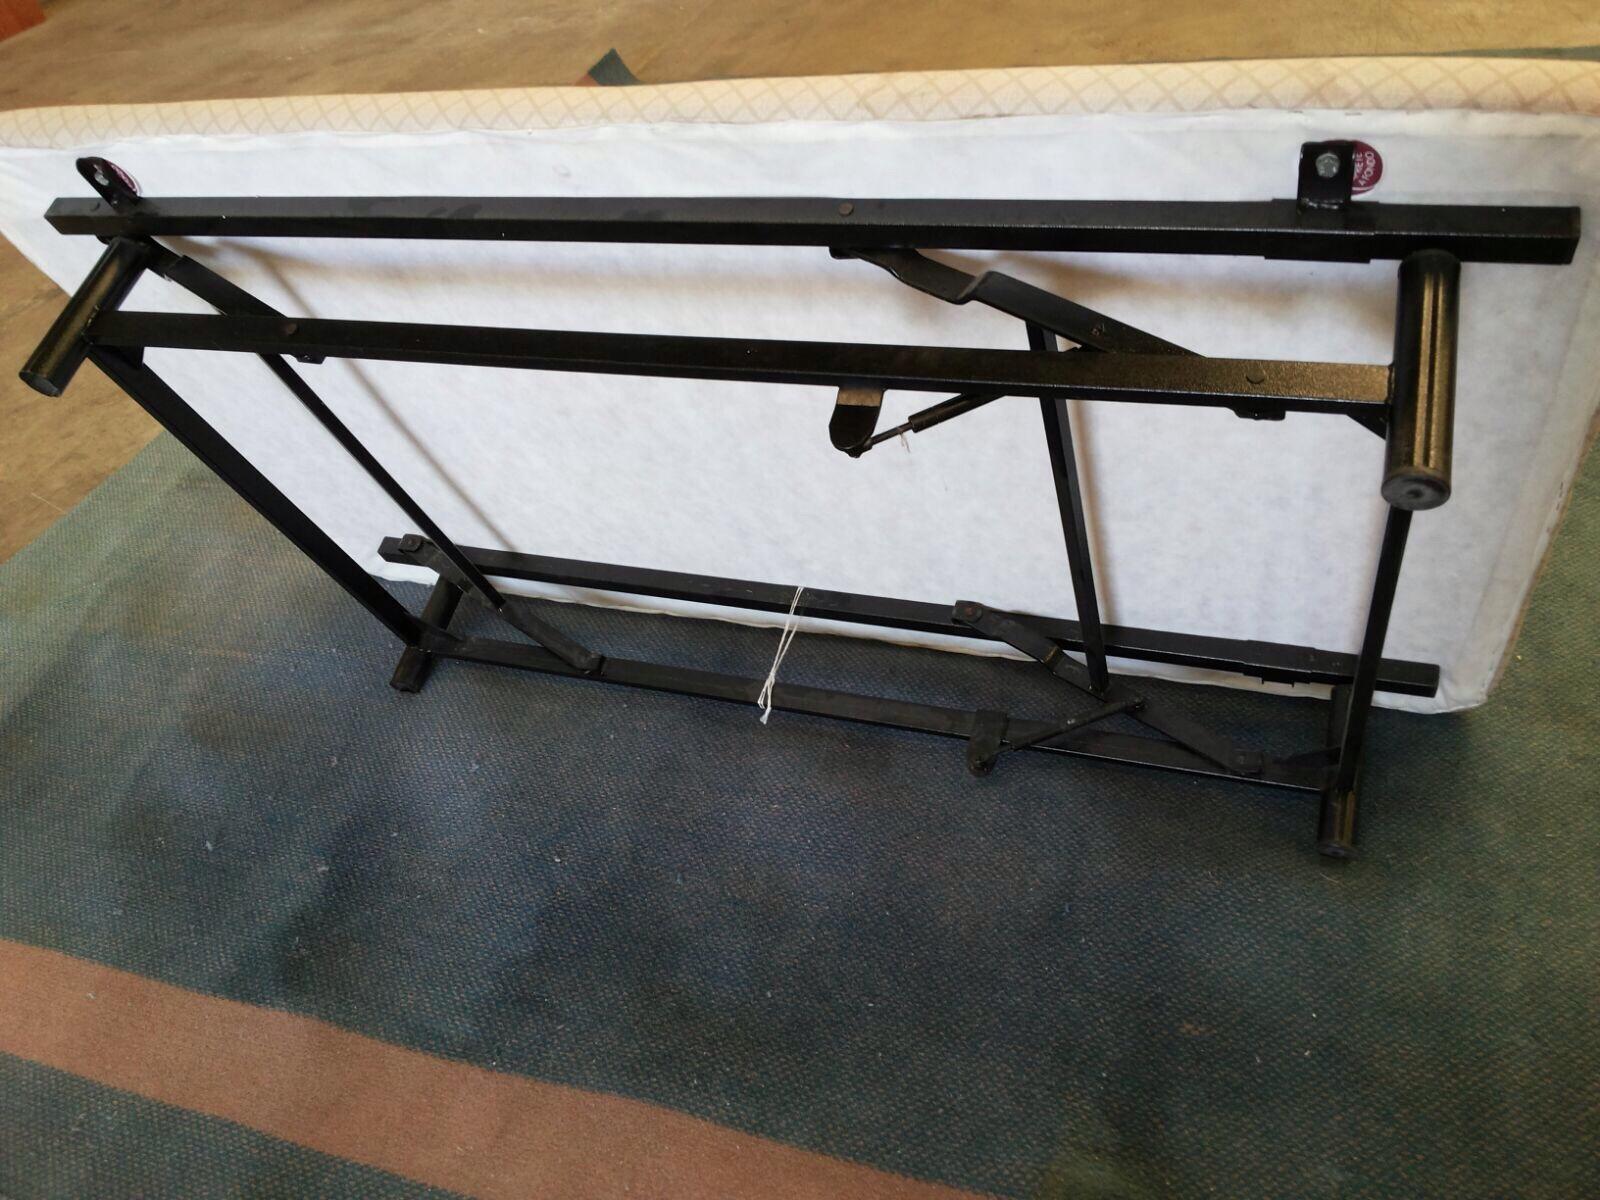 Cama Elevable 2x2m | Pelcam Segundamano